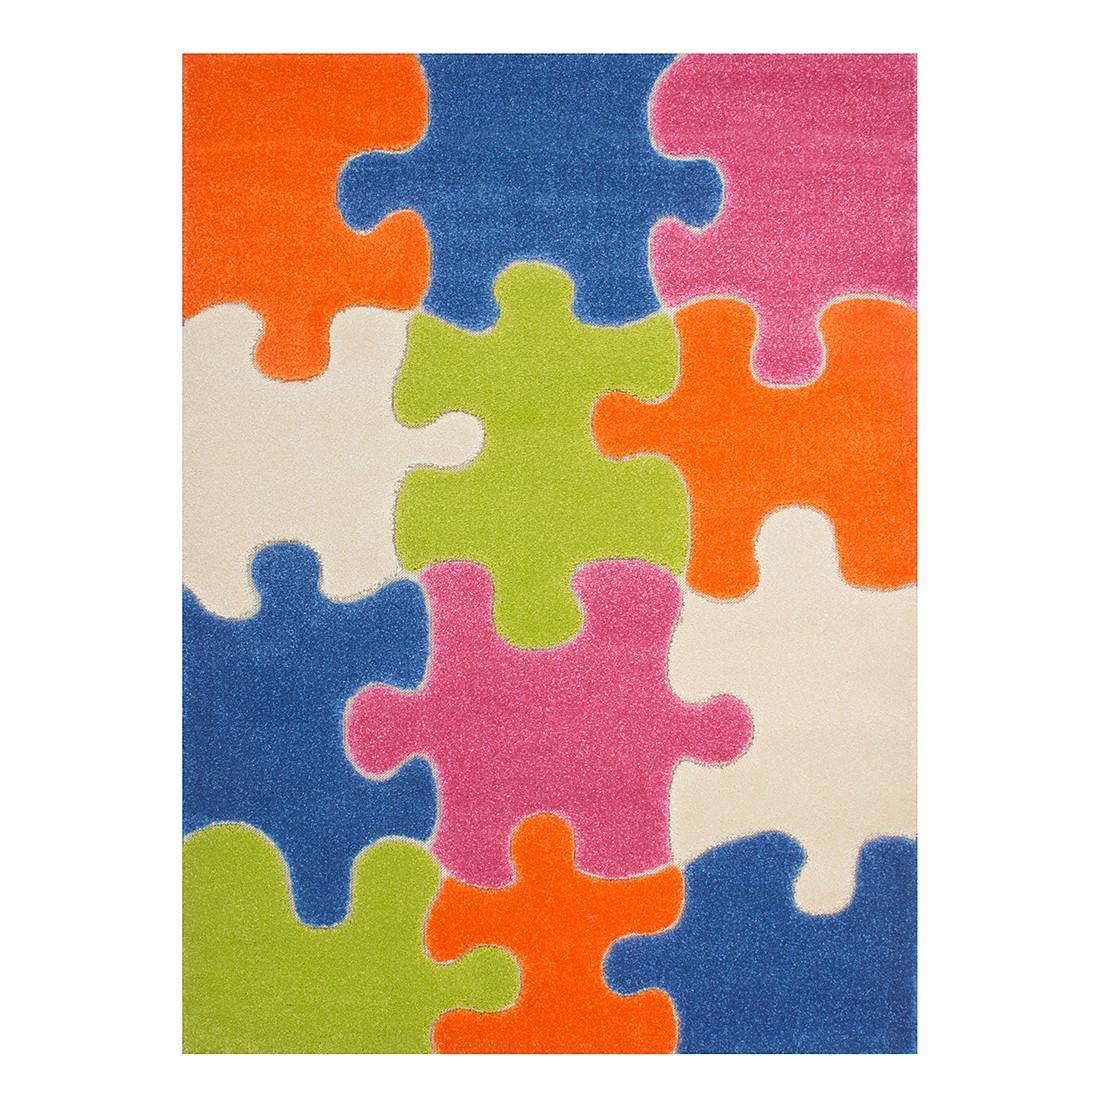 Kinderteppich Puzzle – Multicolor – 100 x 150 cm, Kayoom günstig